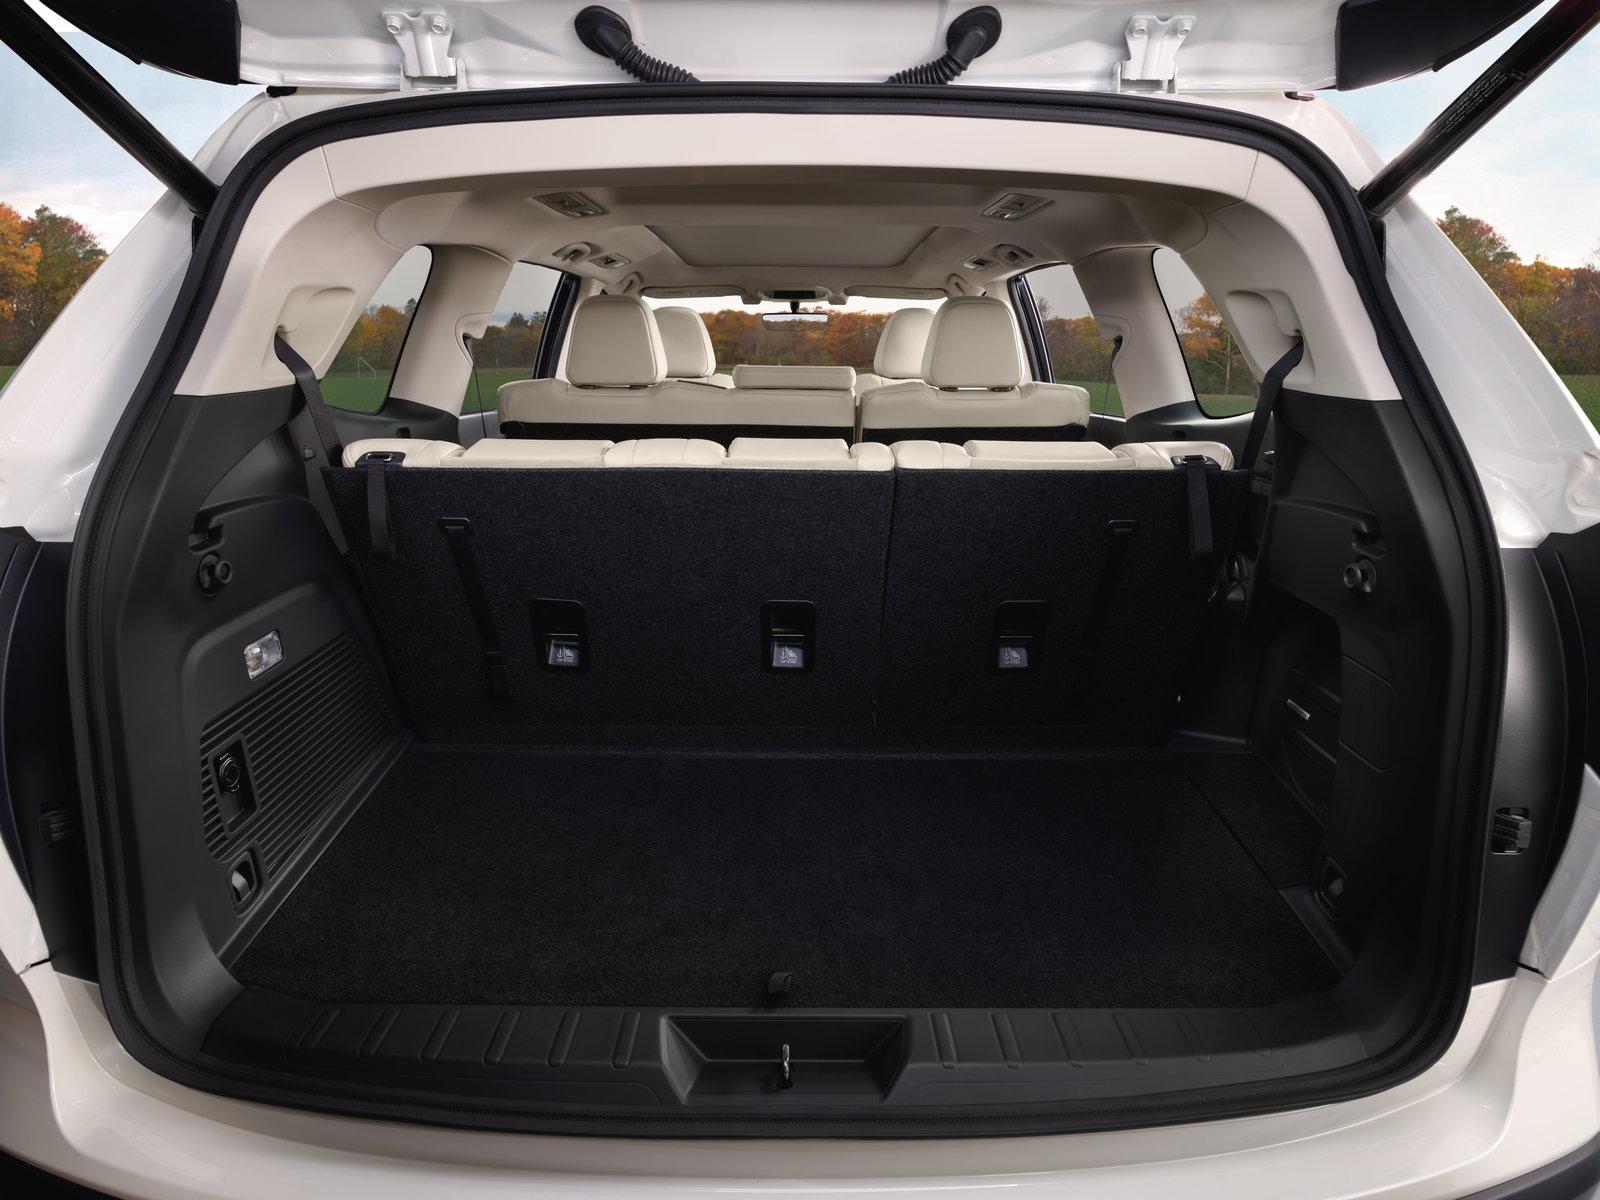 2019 Subaru Ascent: Preview, Pricing, Release Date